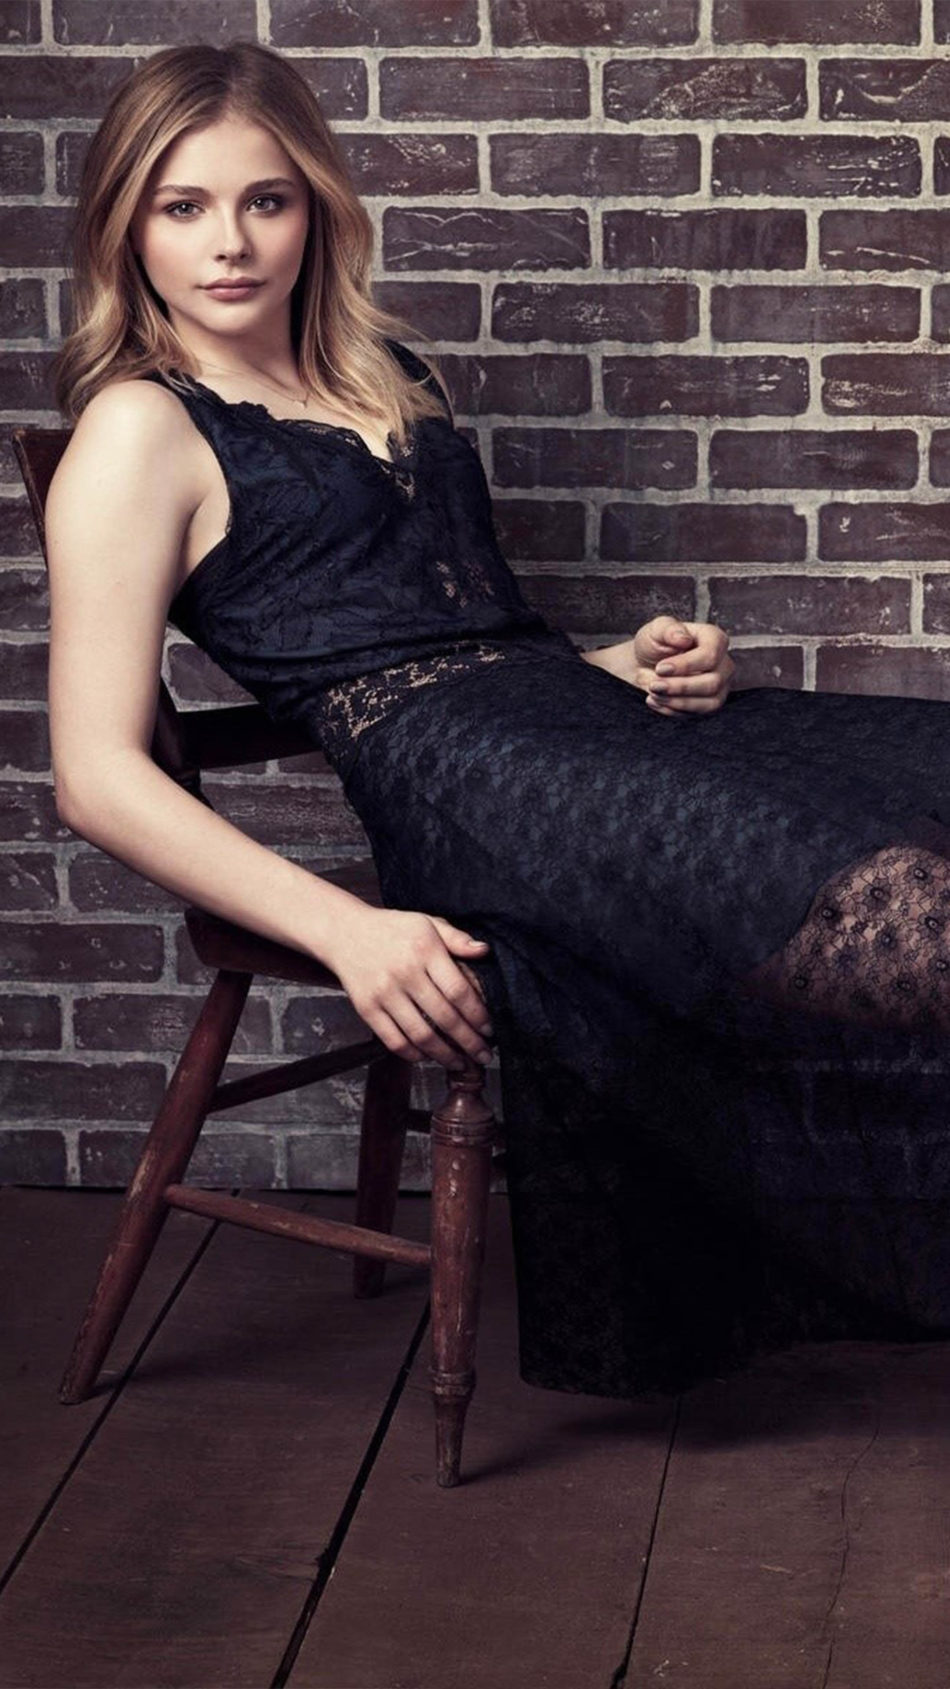 Chloe Moretz Black Dress Photoshoot 4K Ultra HD Mobile Wallpaper